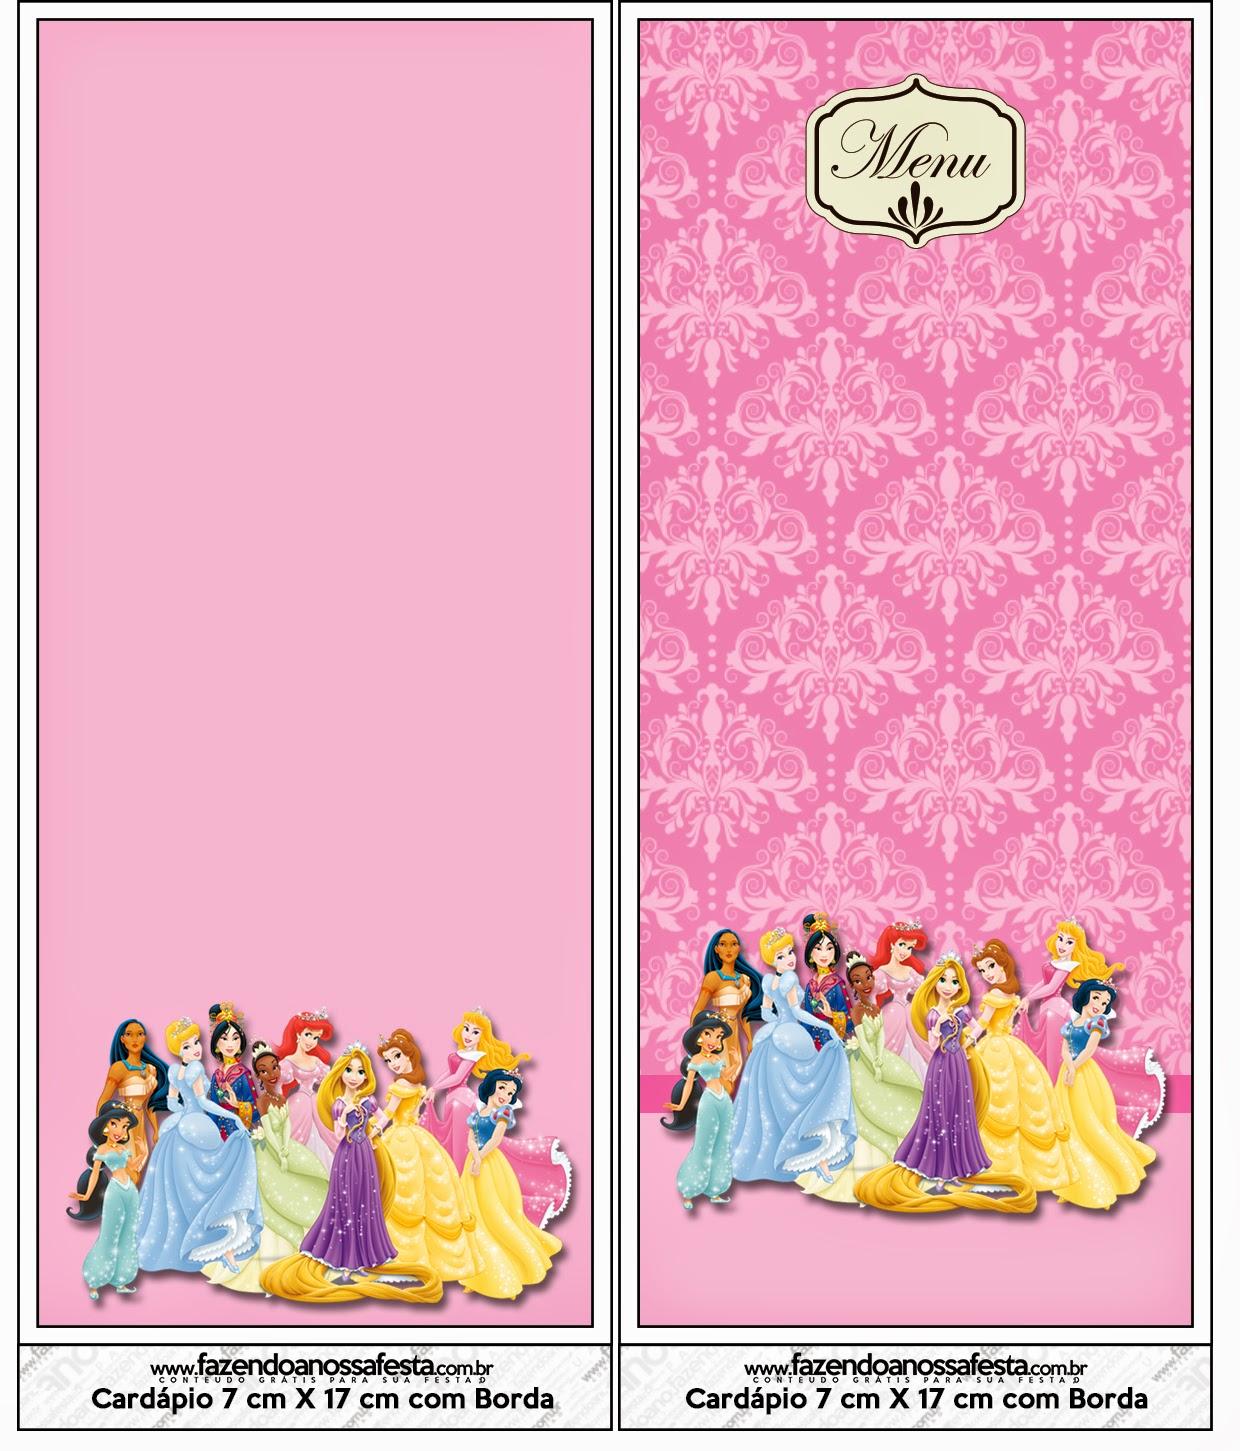 Menú de Princesas Disney para imprimir gratis.